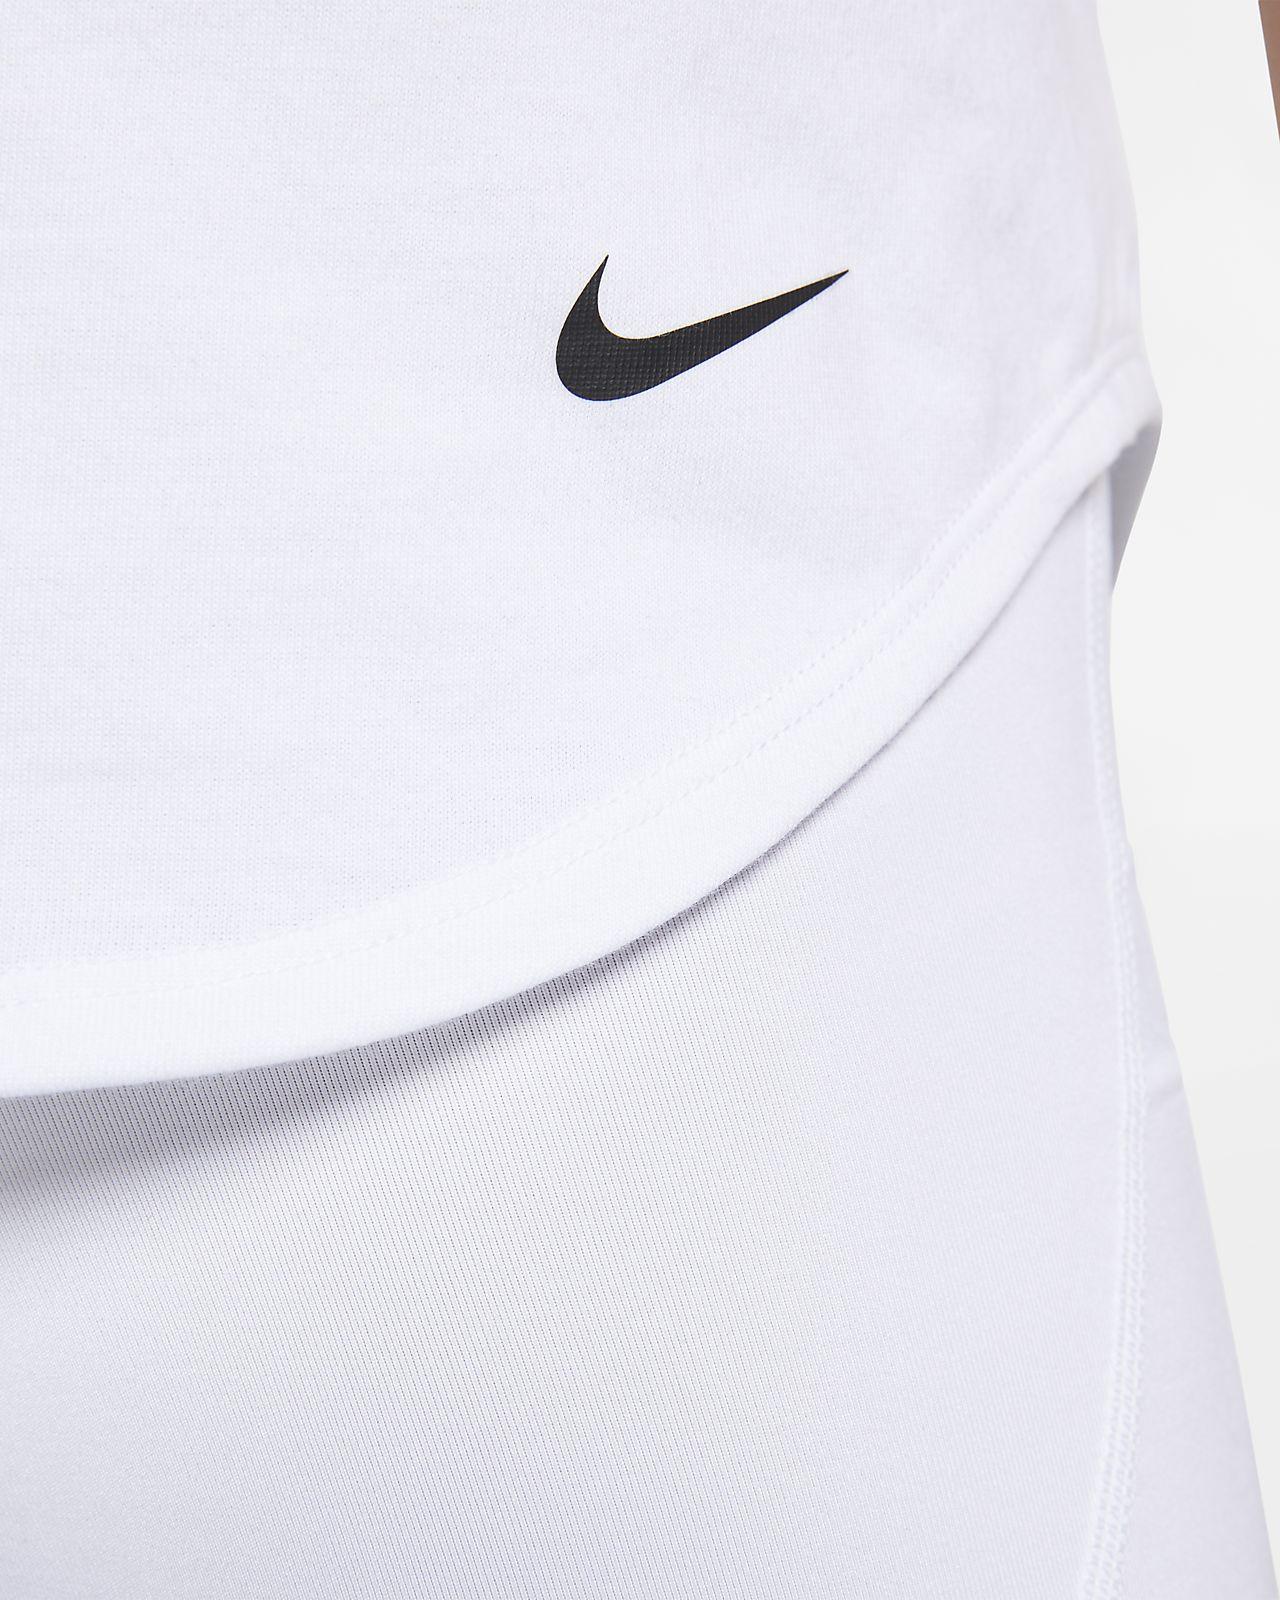 Camiseta Entrenamiento Para NikeMx Mujer Tirantes De 8vNwOmn0